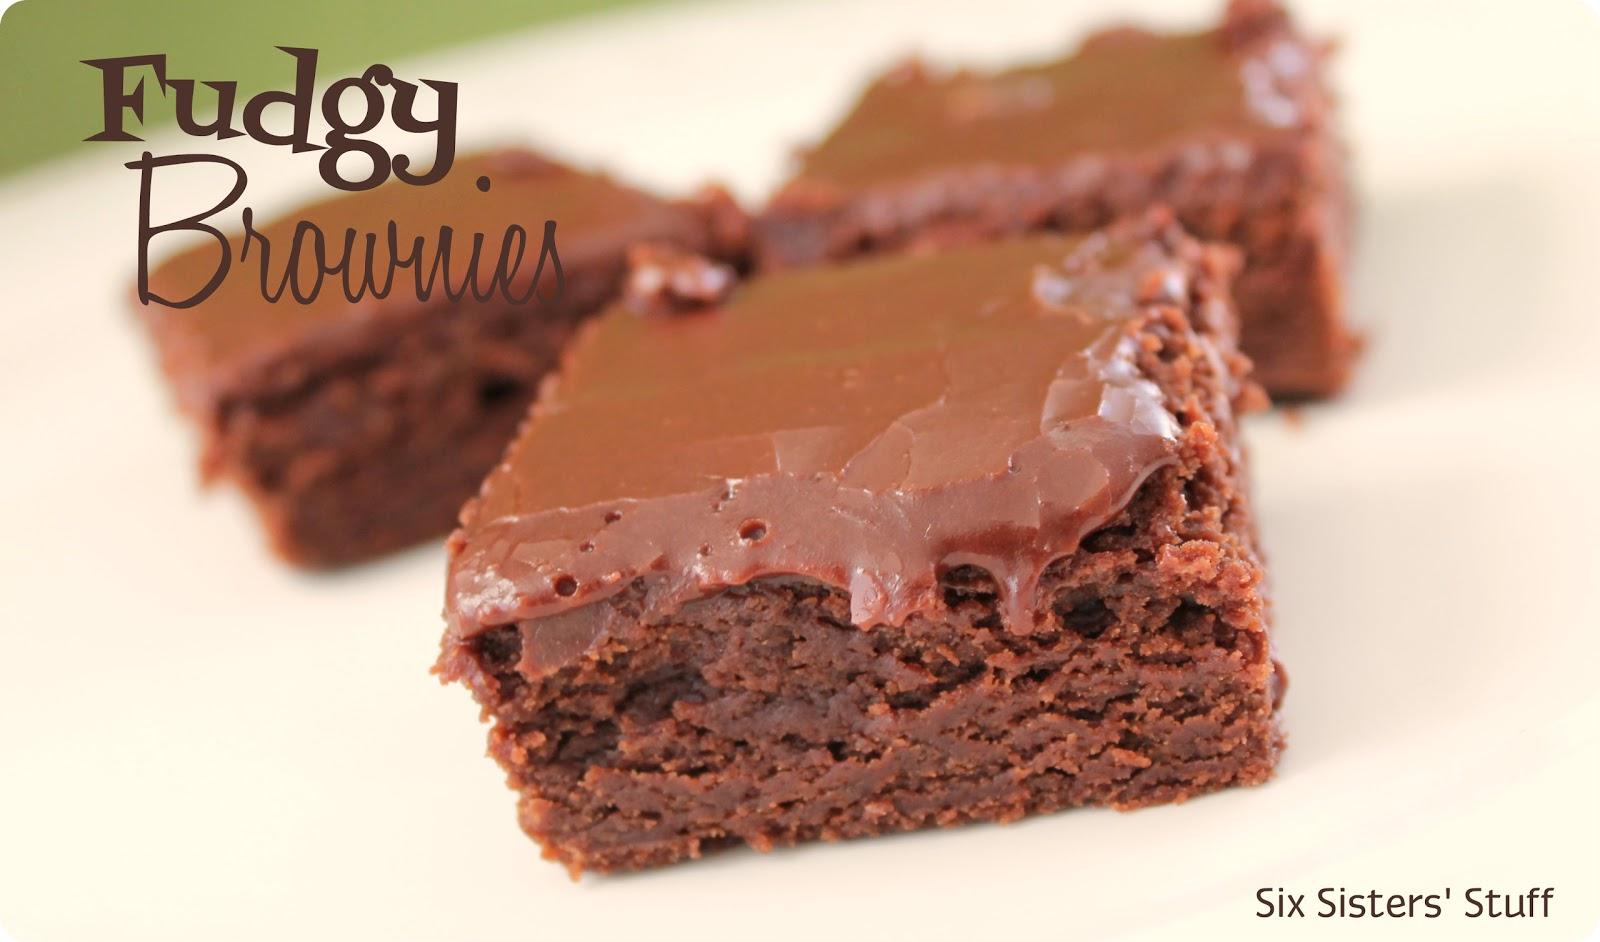 Fudgy Brownies Recipe | Six Sisters' Stuff